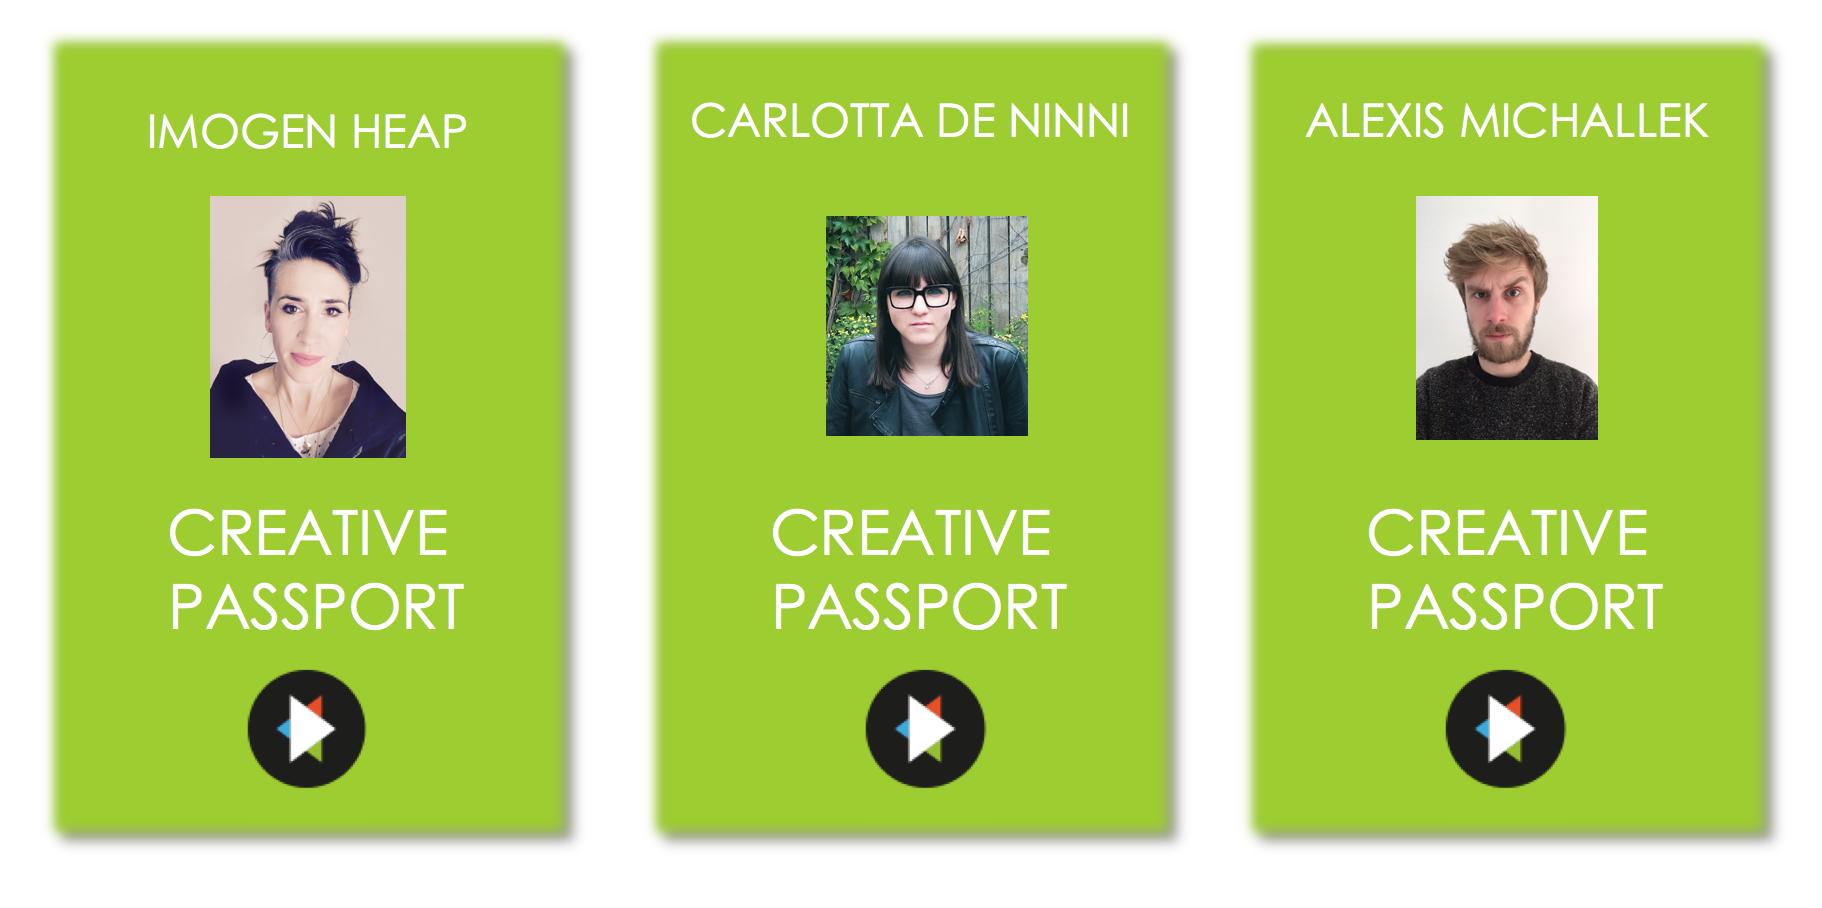 mycelia-creative-passports